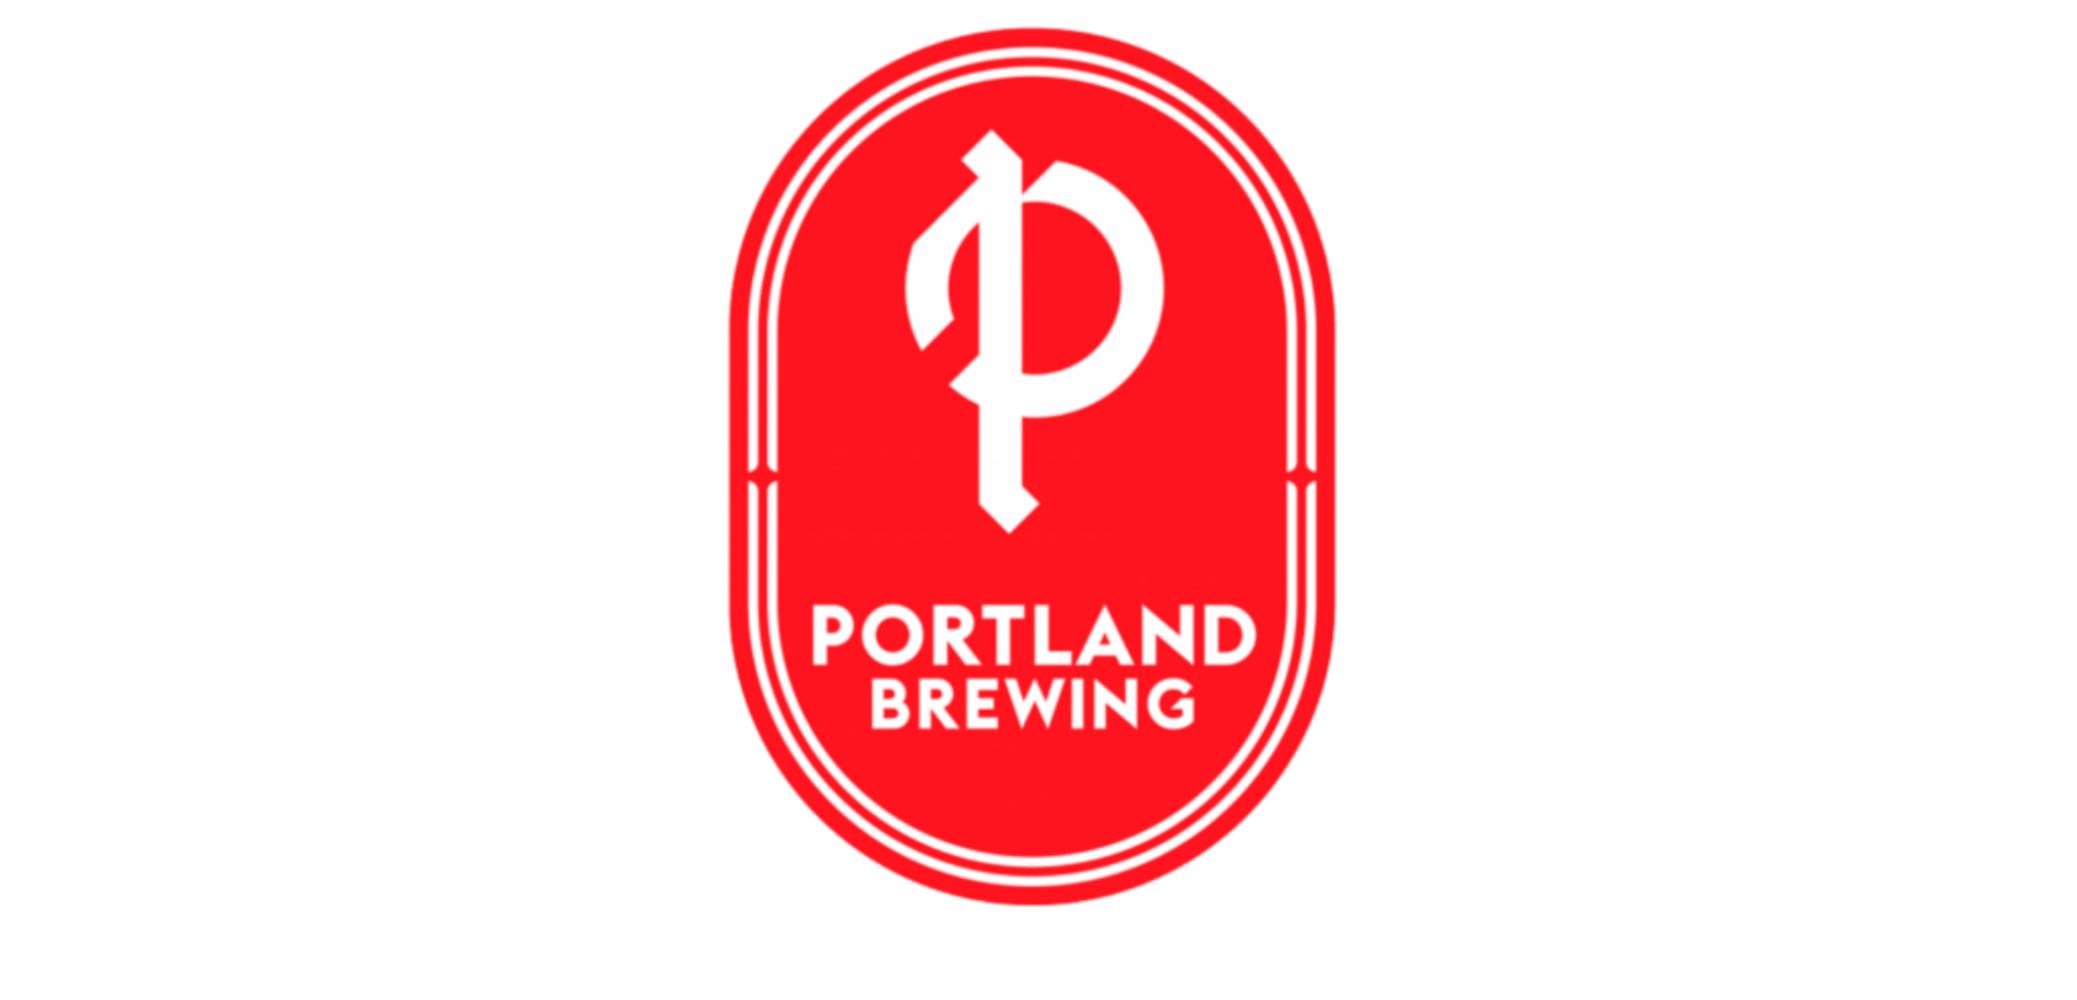 Portland Brewing: 578 Lot High Volume Microbrewery: 2015 Alfa Laval Clarifier, 2019 Alfa Laval Decanter, (56) FVs & Brites 40 - 580BBL, Filling